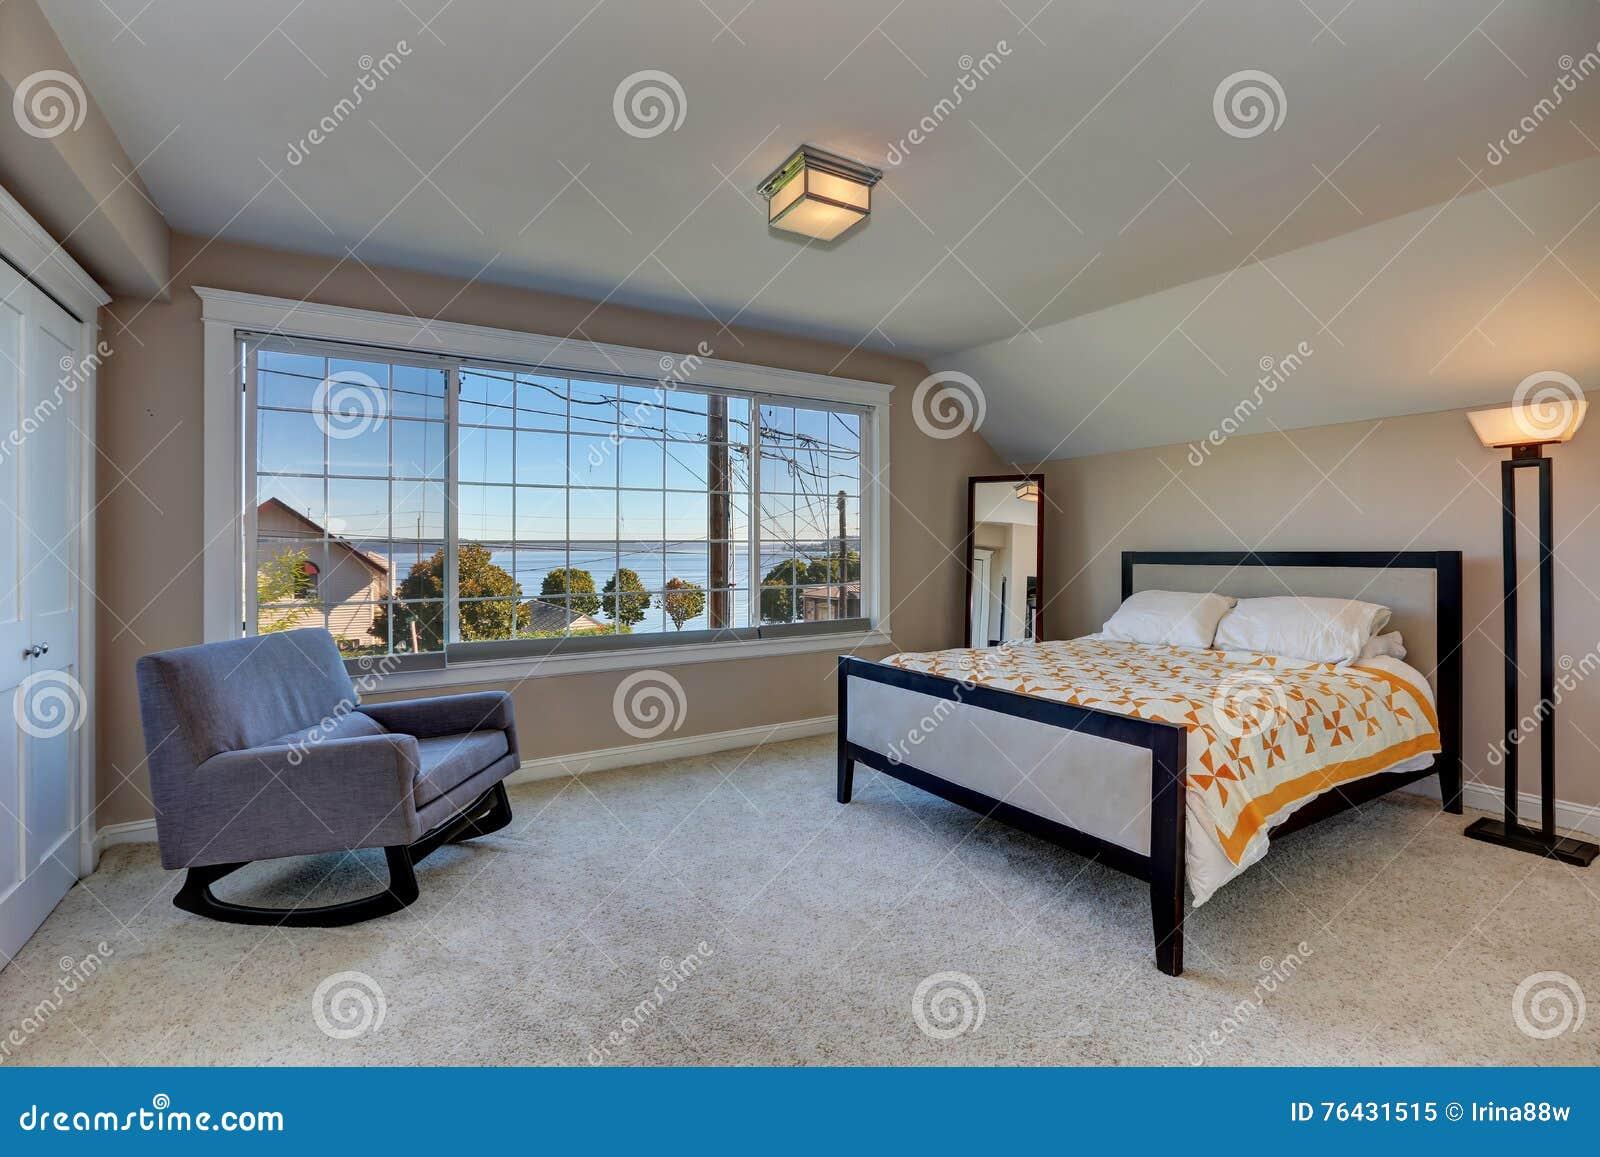 Fine Simple Yet Elegant Bedroom Interior With Modern Rocking Andrewgaddart Wooden Chair Designs For Living Room Andrewgaddartcom